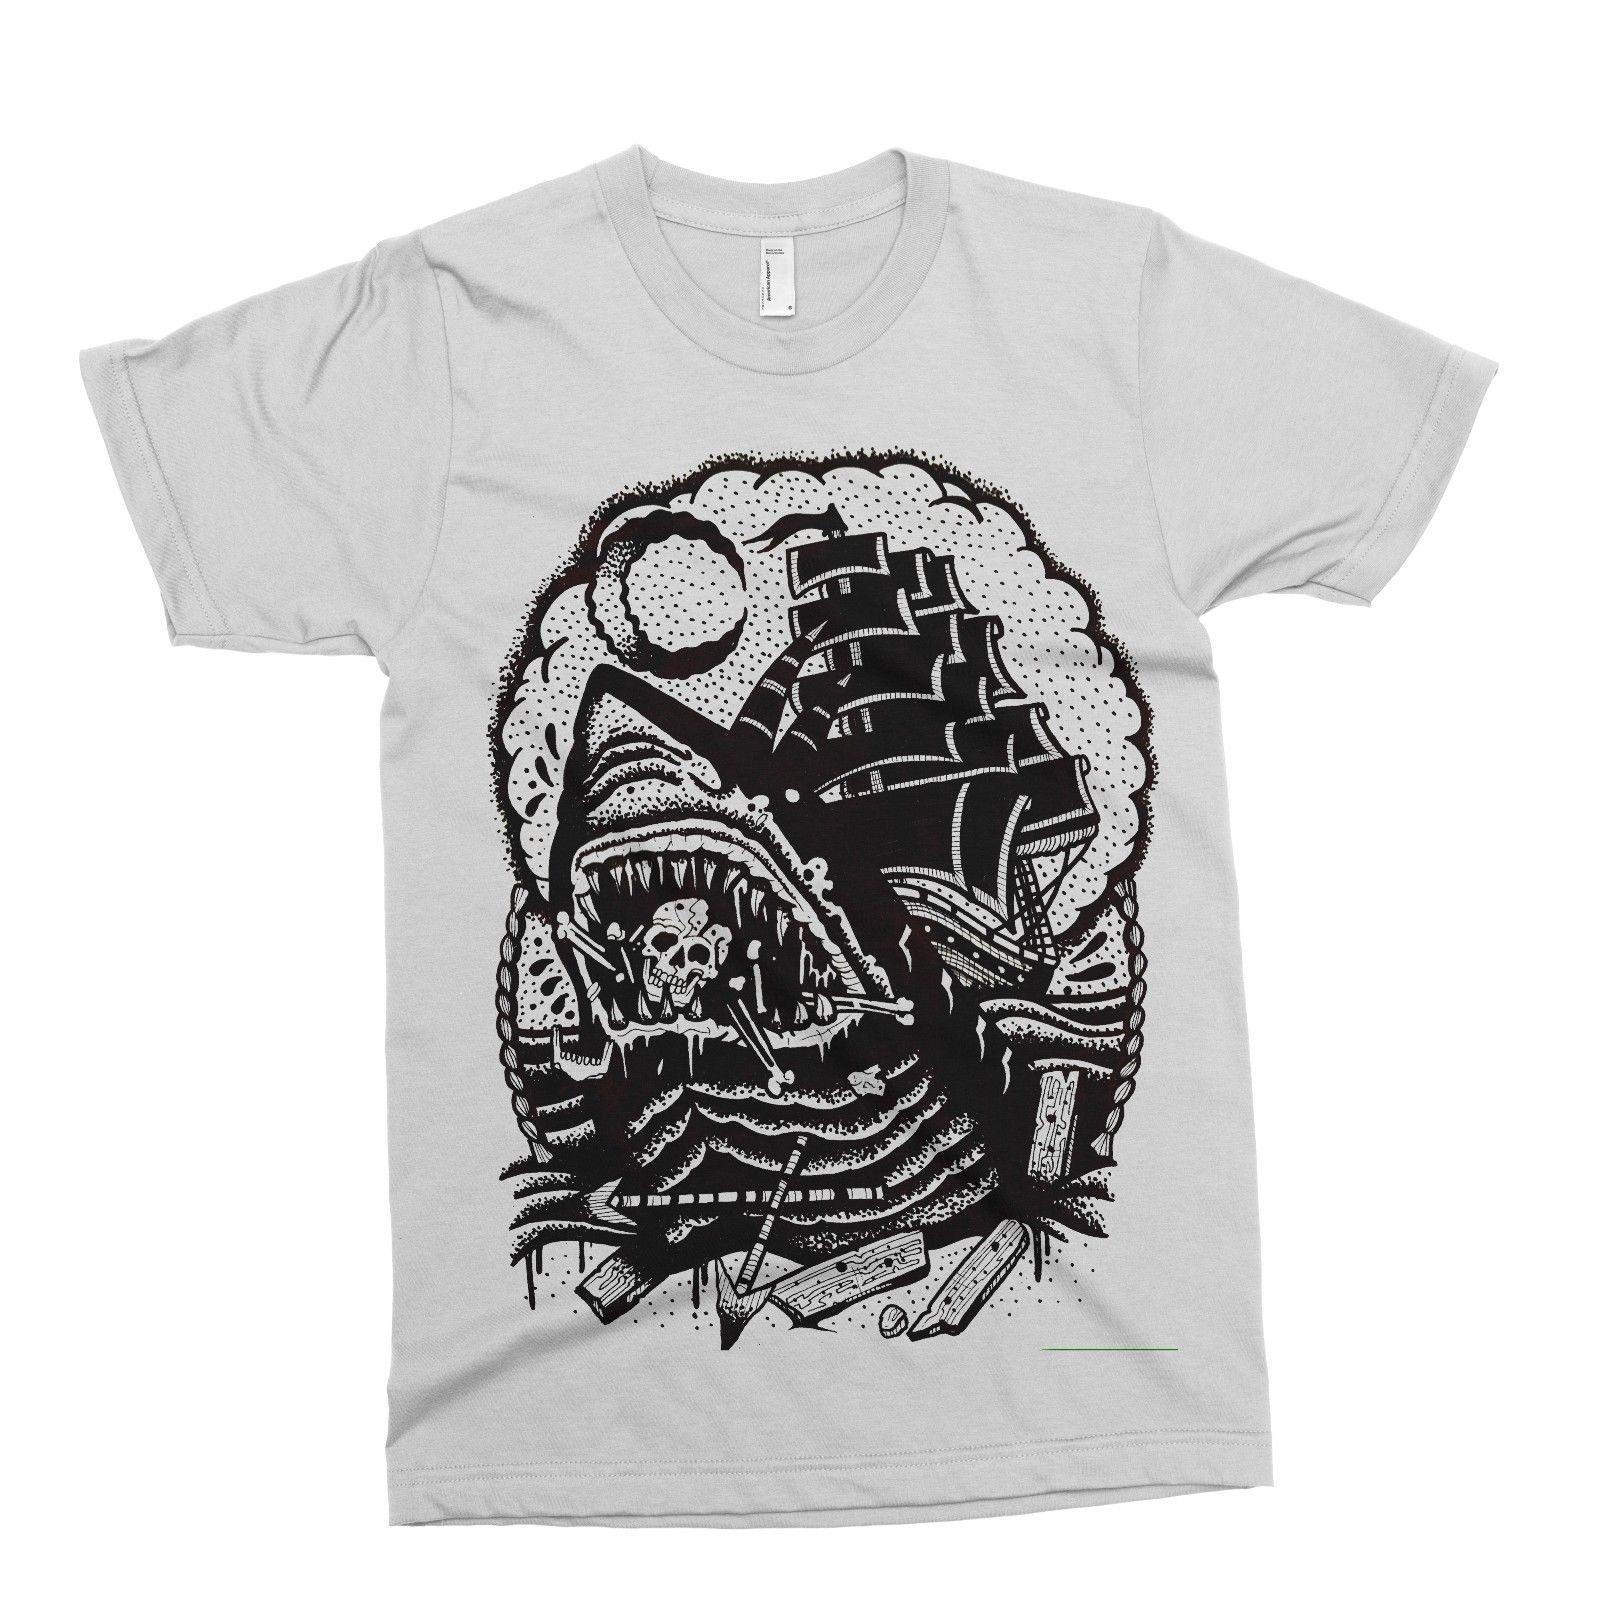 e7b980255d2 Pirate Ship T Shirt Tattoo Alternative Drop Dead Abandon Ship Ark Rebel  Circus Print T Shirt Harajuku Short Sleeve Men Top T Shirt Making T Shirts  For Sale ...